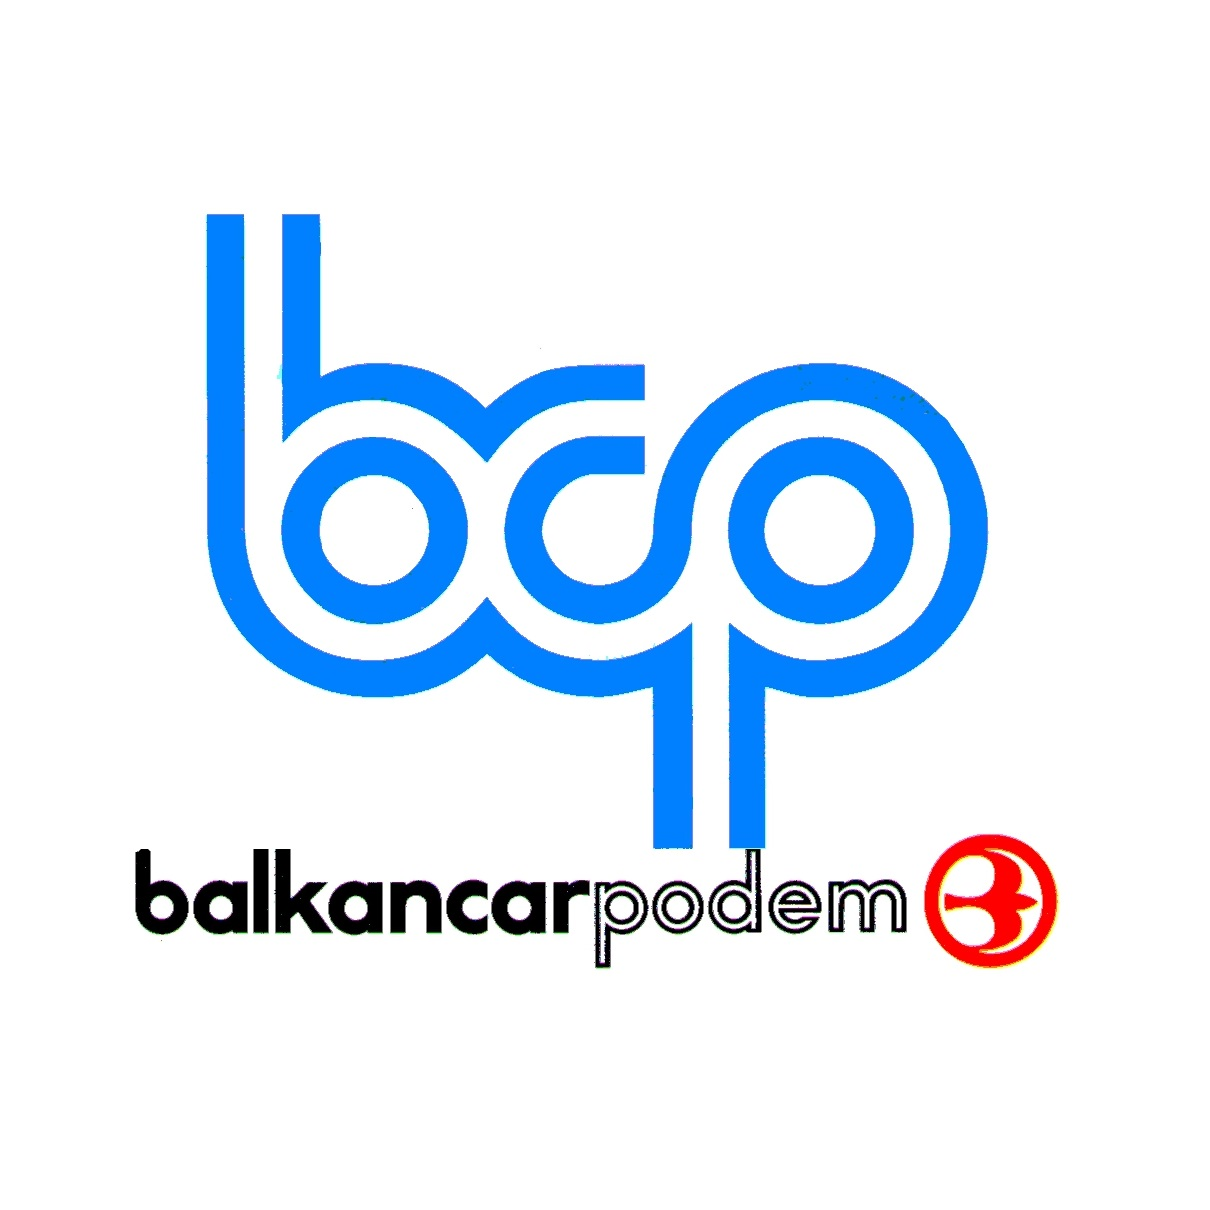 Balkancarpodem